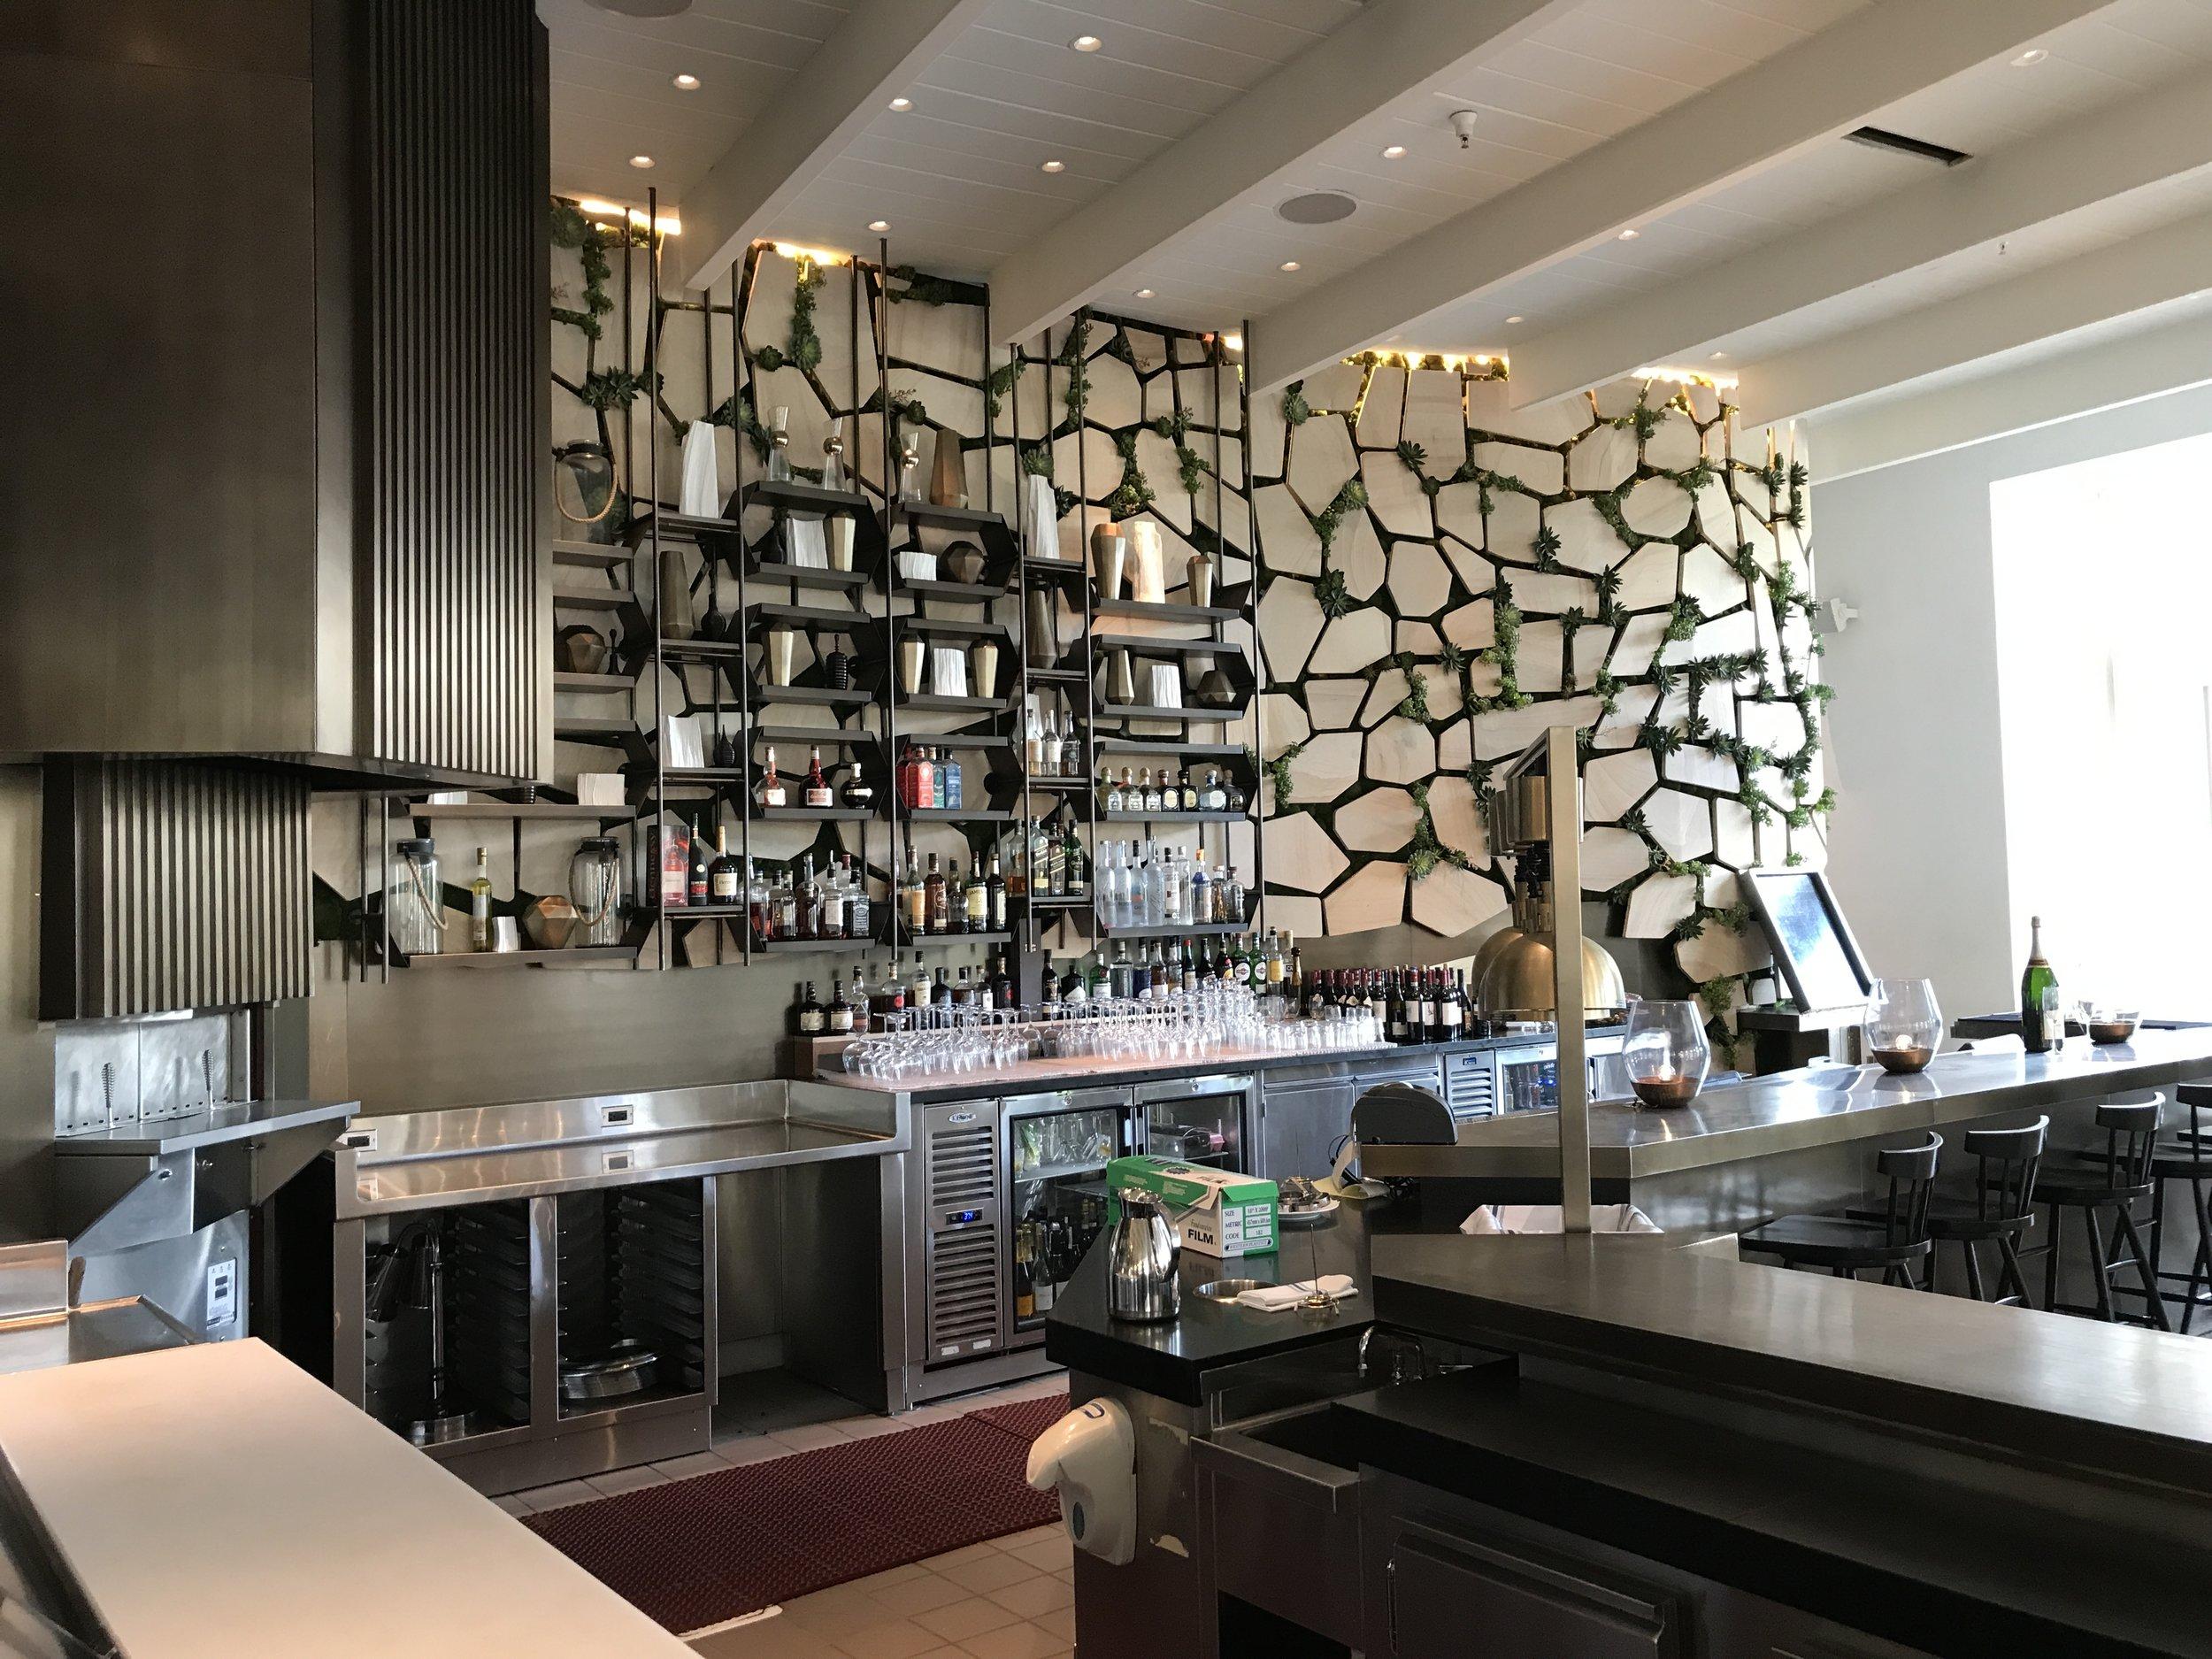 Cleo Restaurant_PDG_Tenant Improvement5.JPG